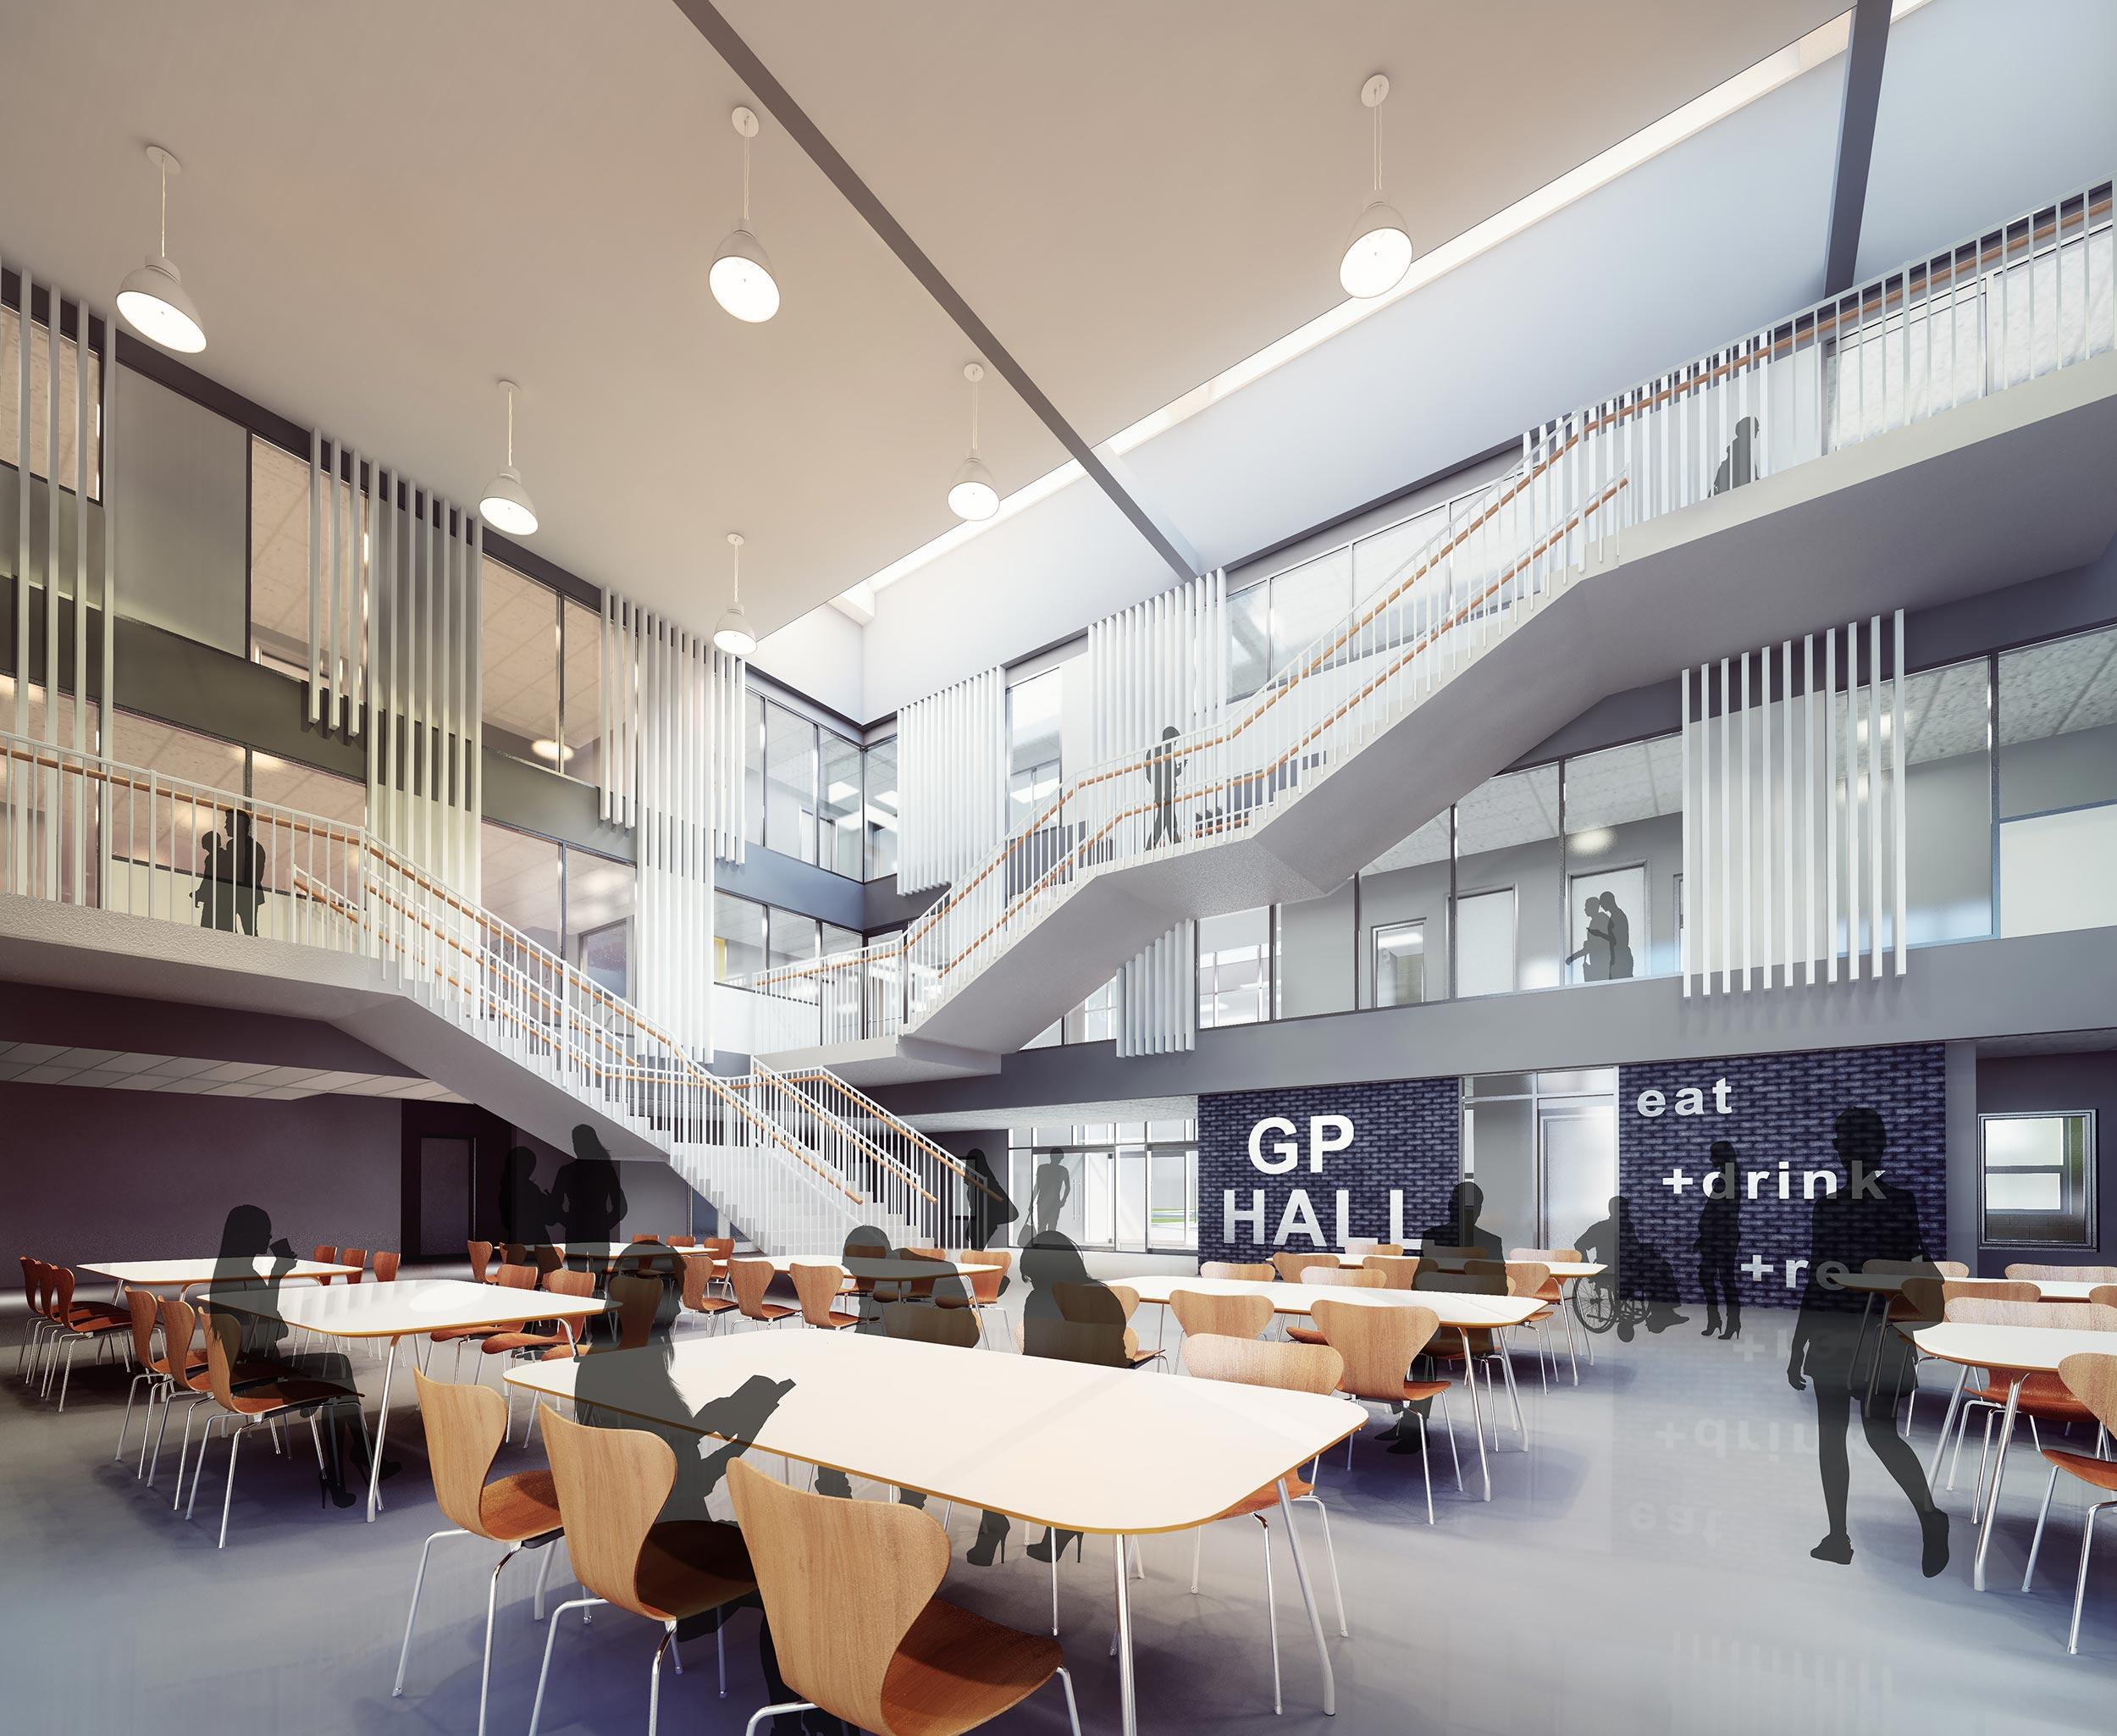 Interior_GP_Hall-redu.jpg